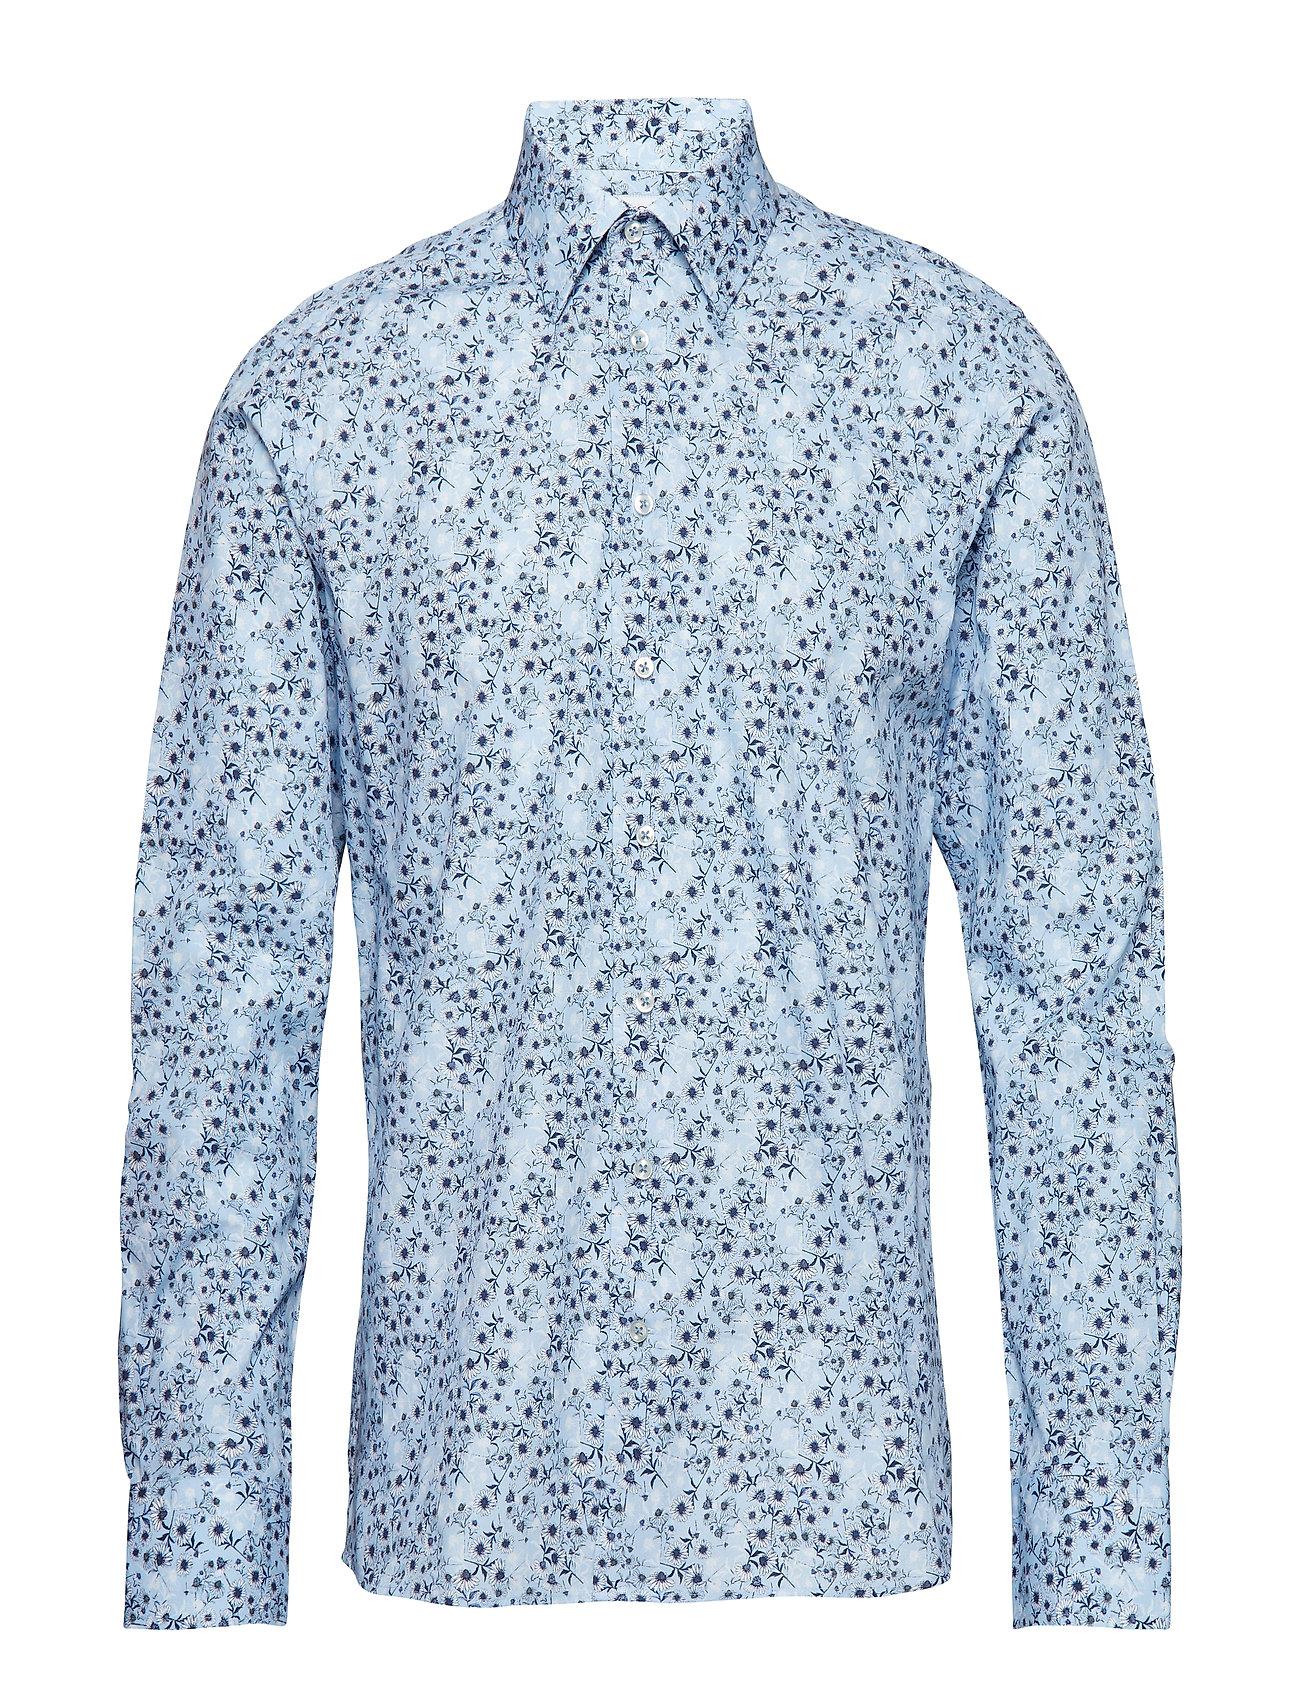 Sand Shirtmaker Copenhagen ScblueXo 8171Gordon By oCeWrdQxBE